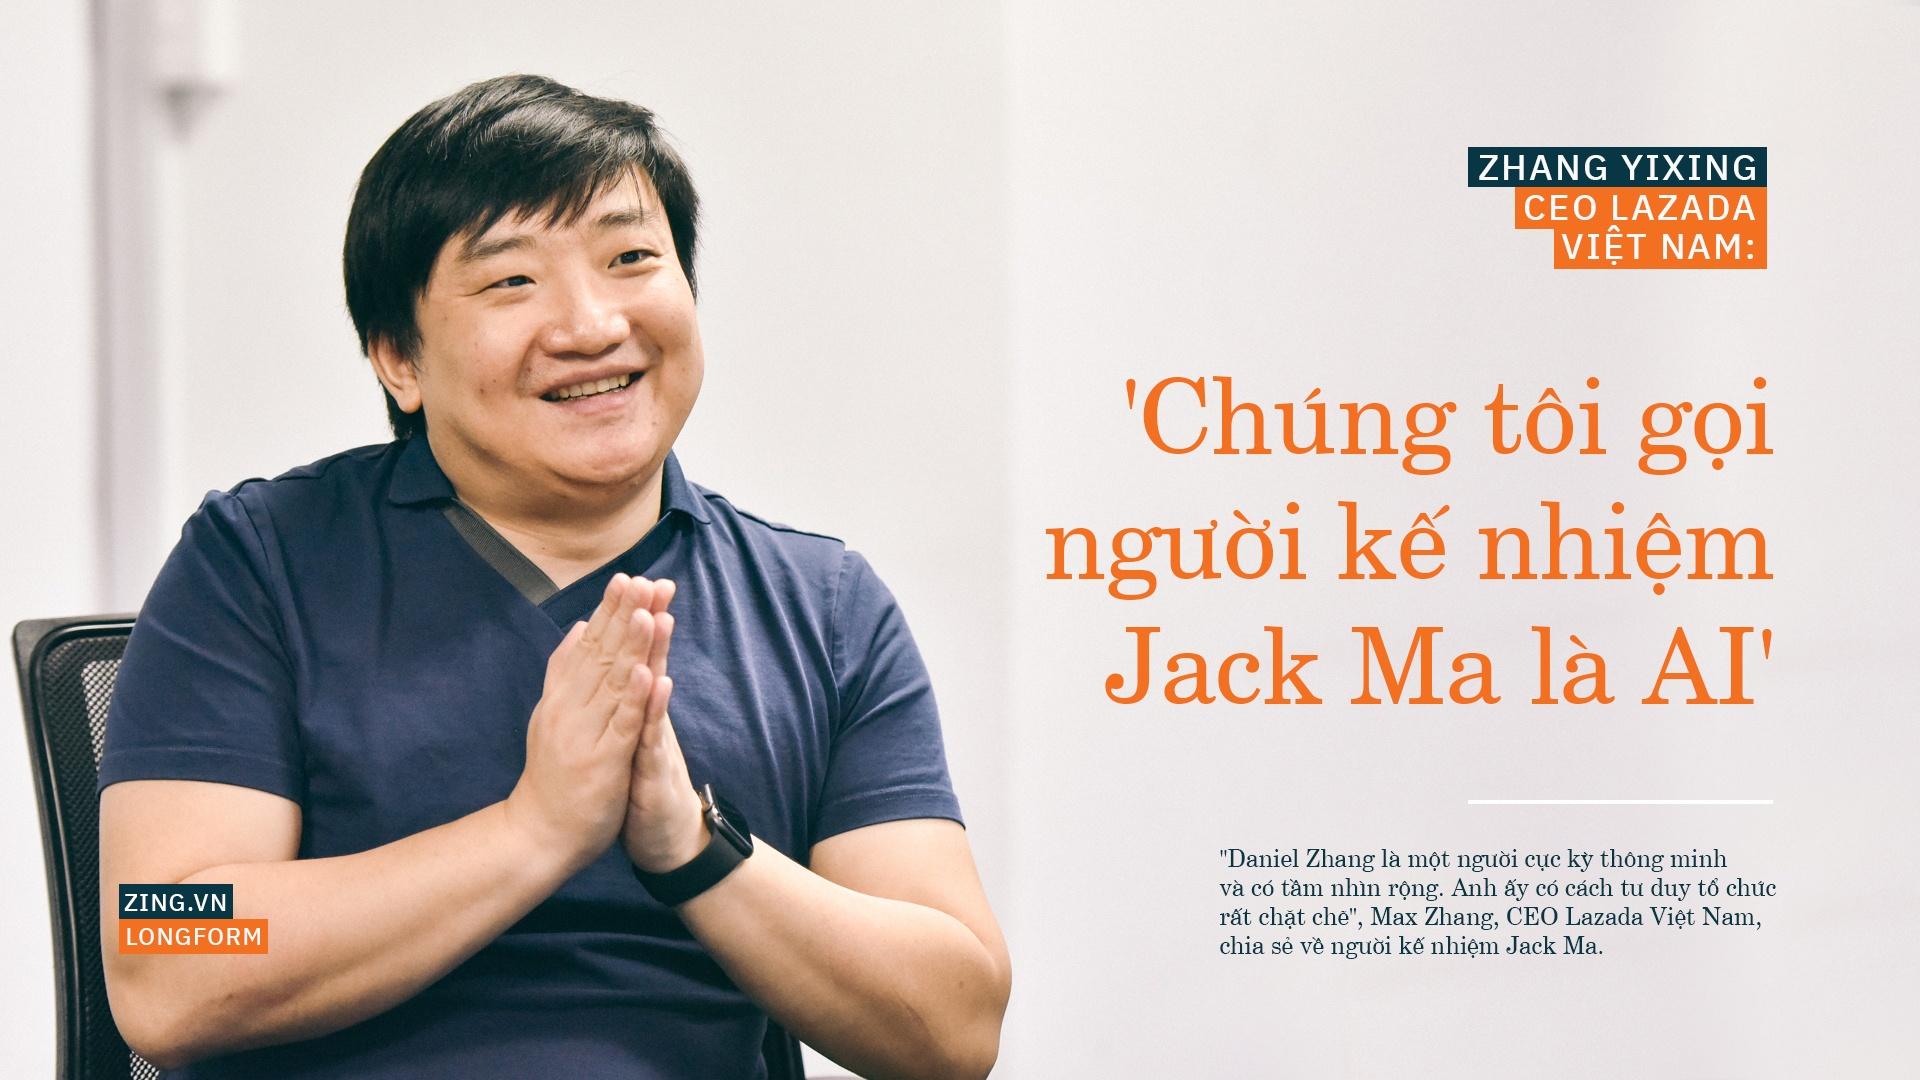 CEO Lazada Viet Nam: 'Chung toi goi nguoi ke nhiem Jack Ma la AI' hinh anh 2